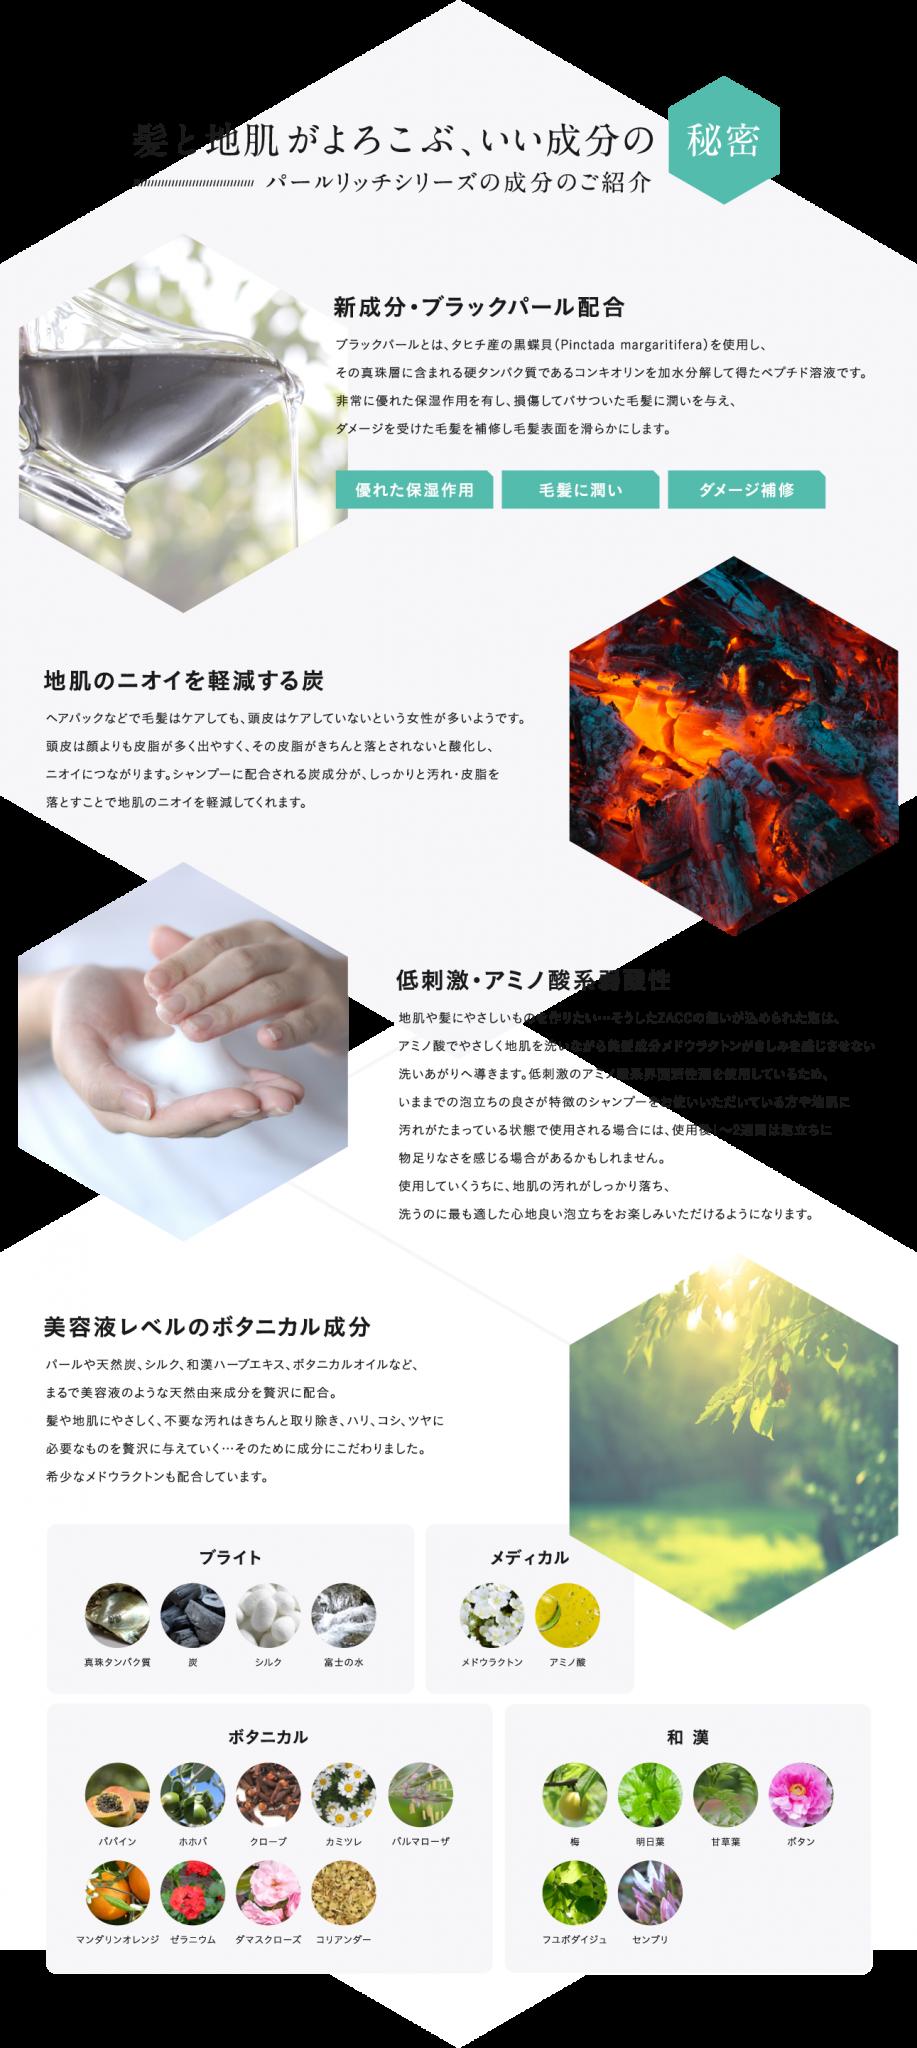 ZACCパールリッチシャンプーの効果・効能